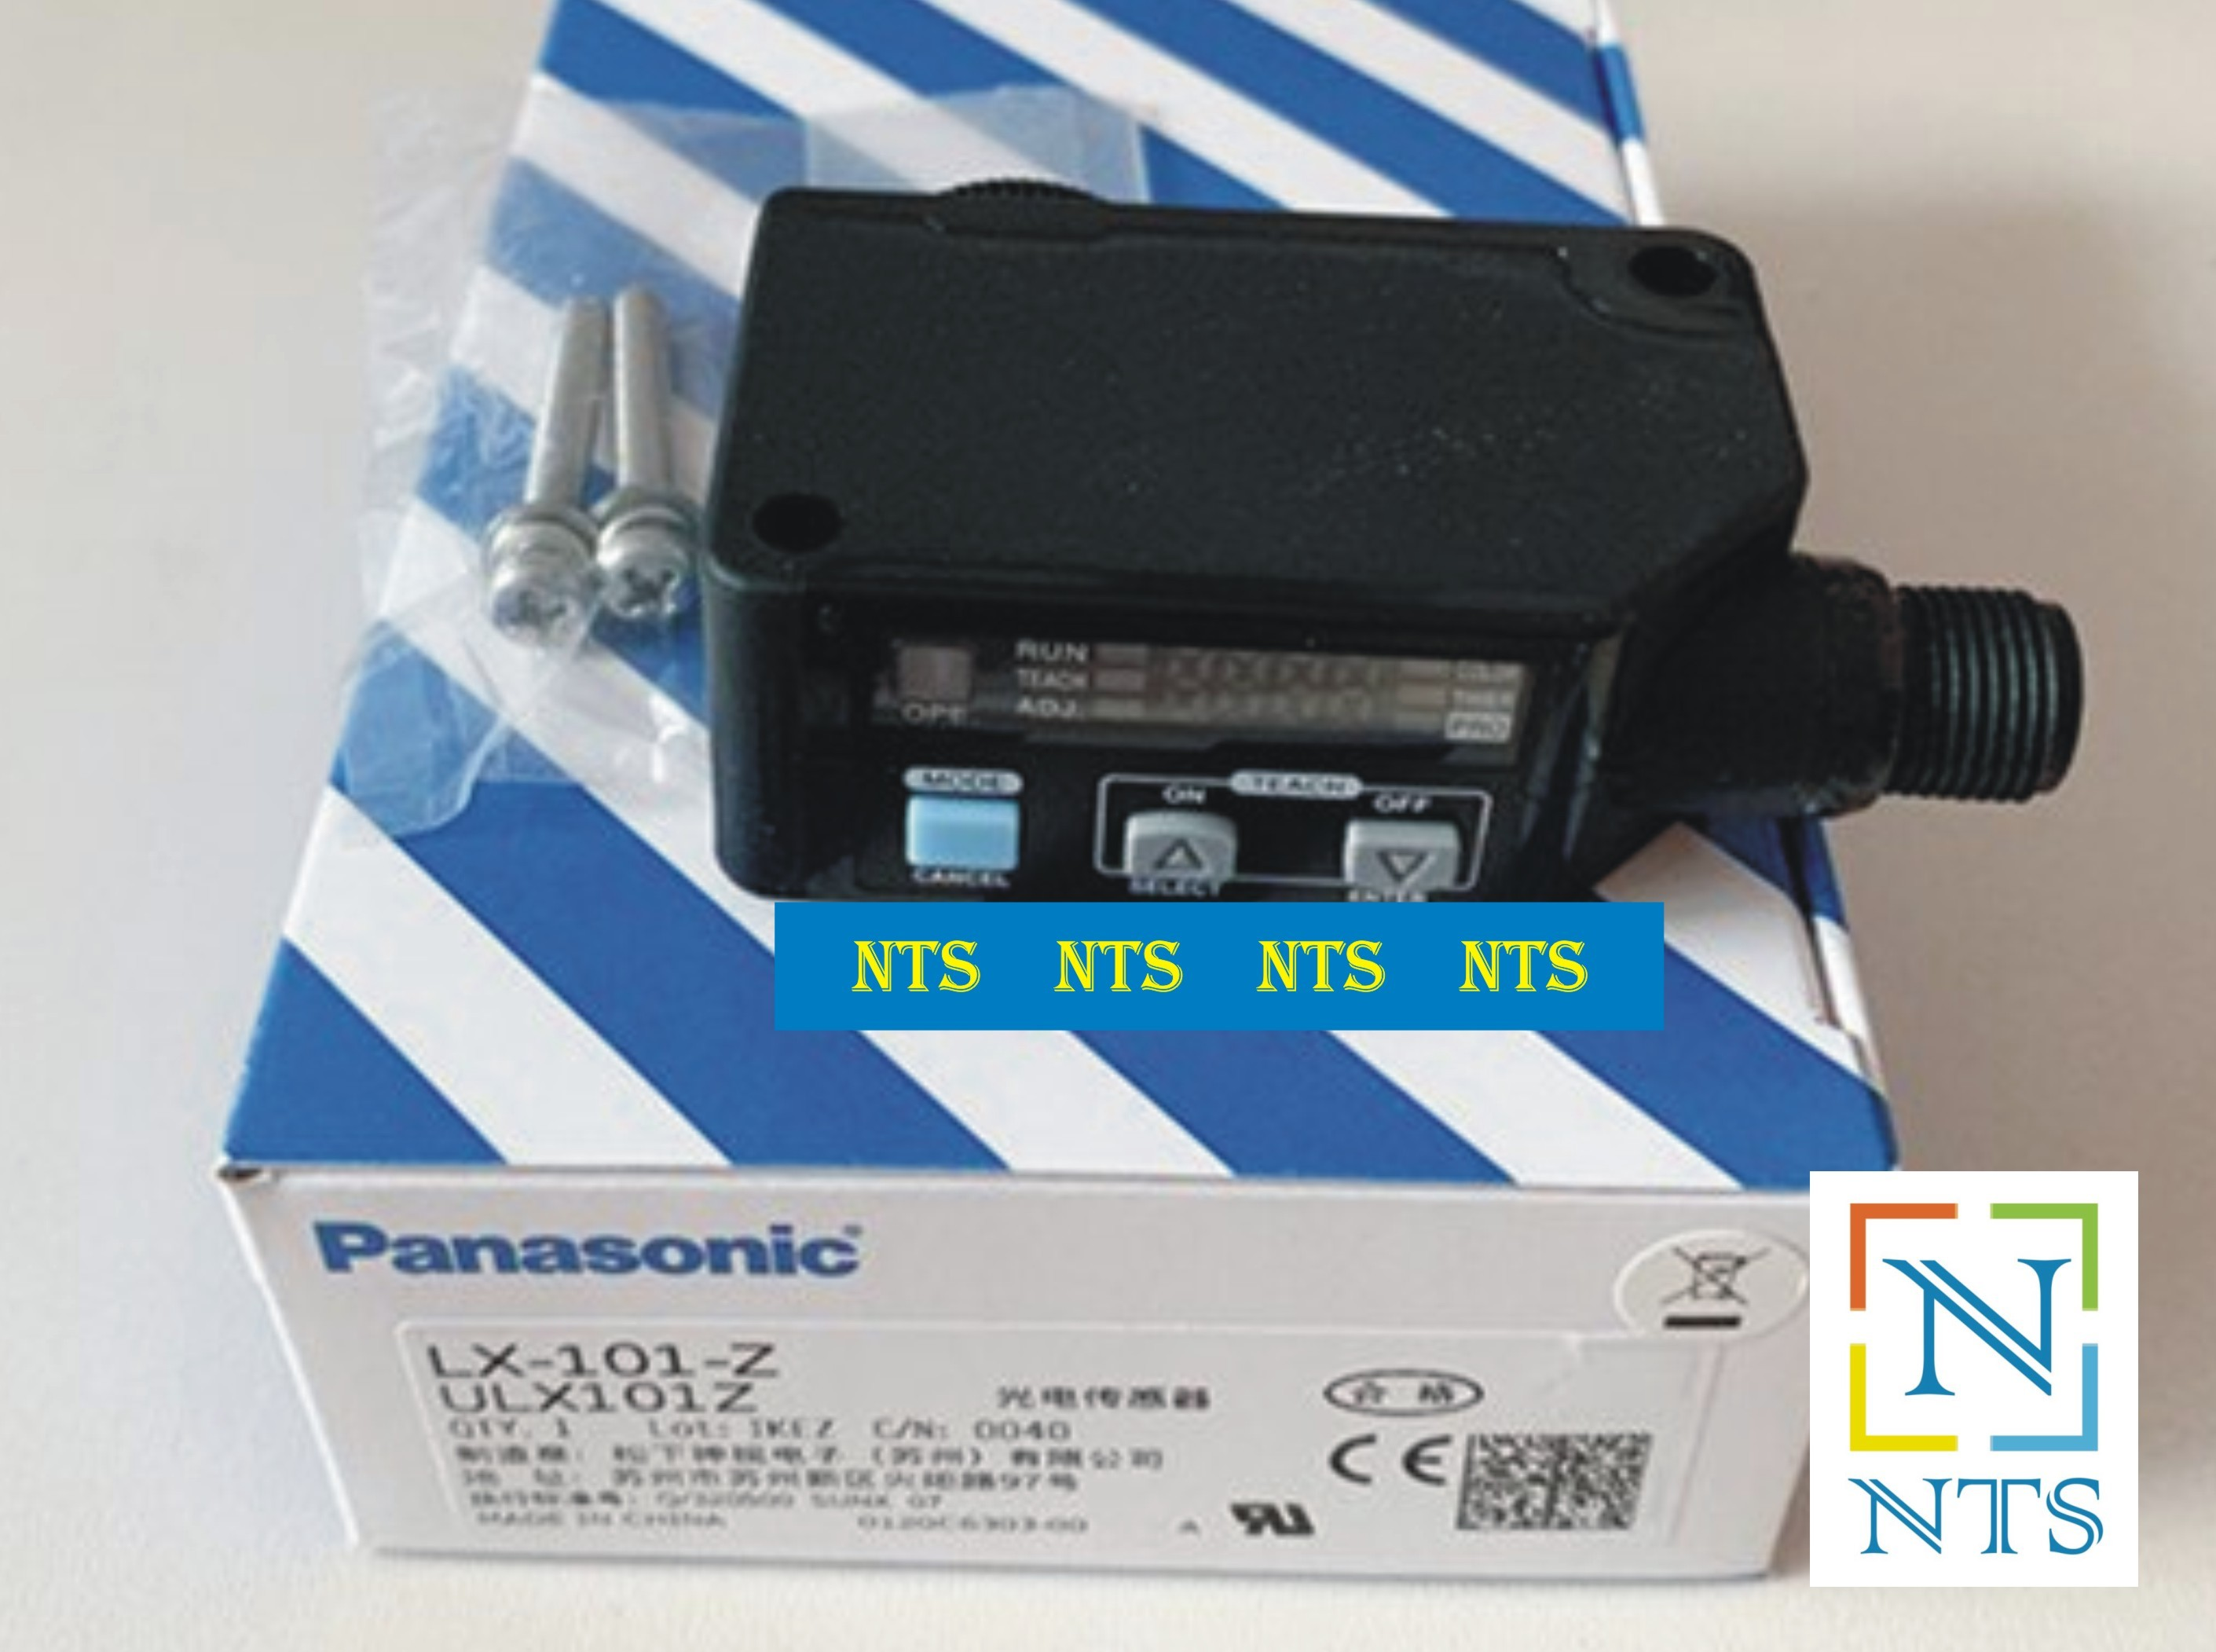 Panasonic LX-101-Z Color Sensor